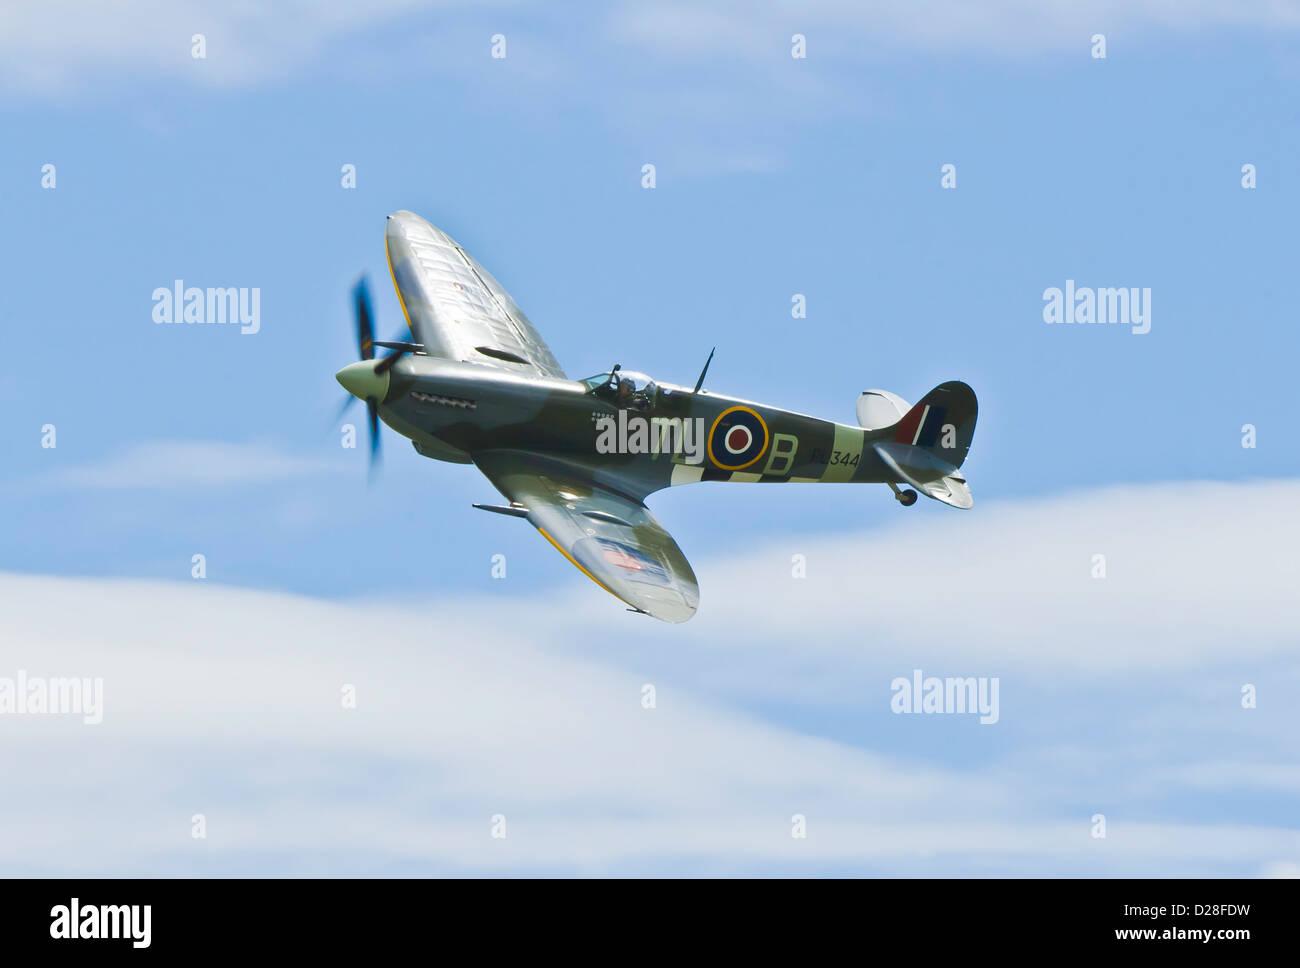 Supermarine Spitfire mk9 - Stock Image